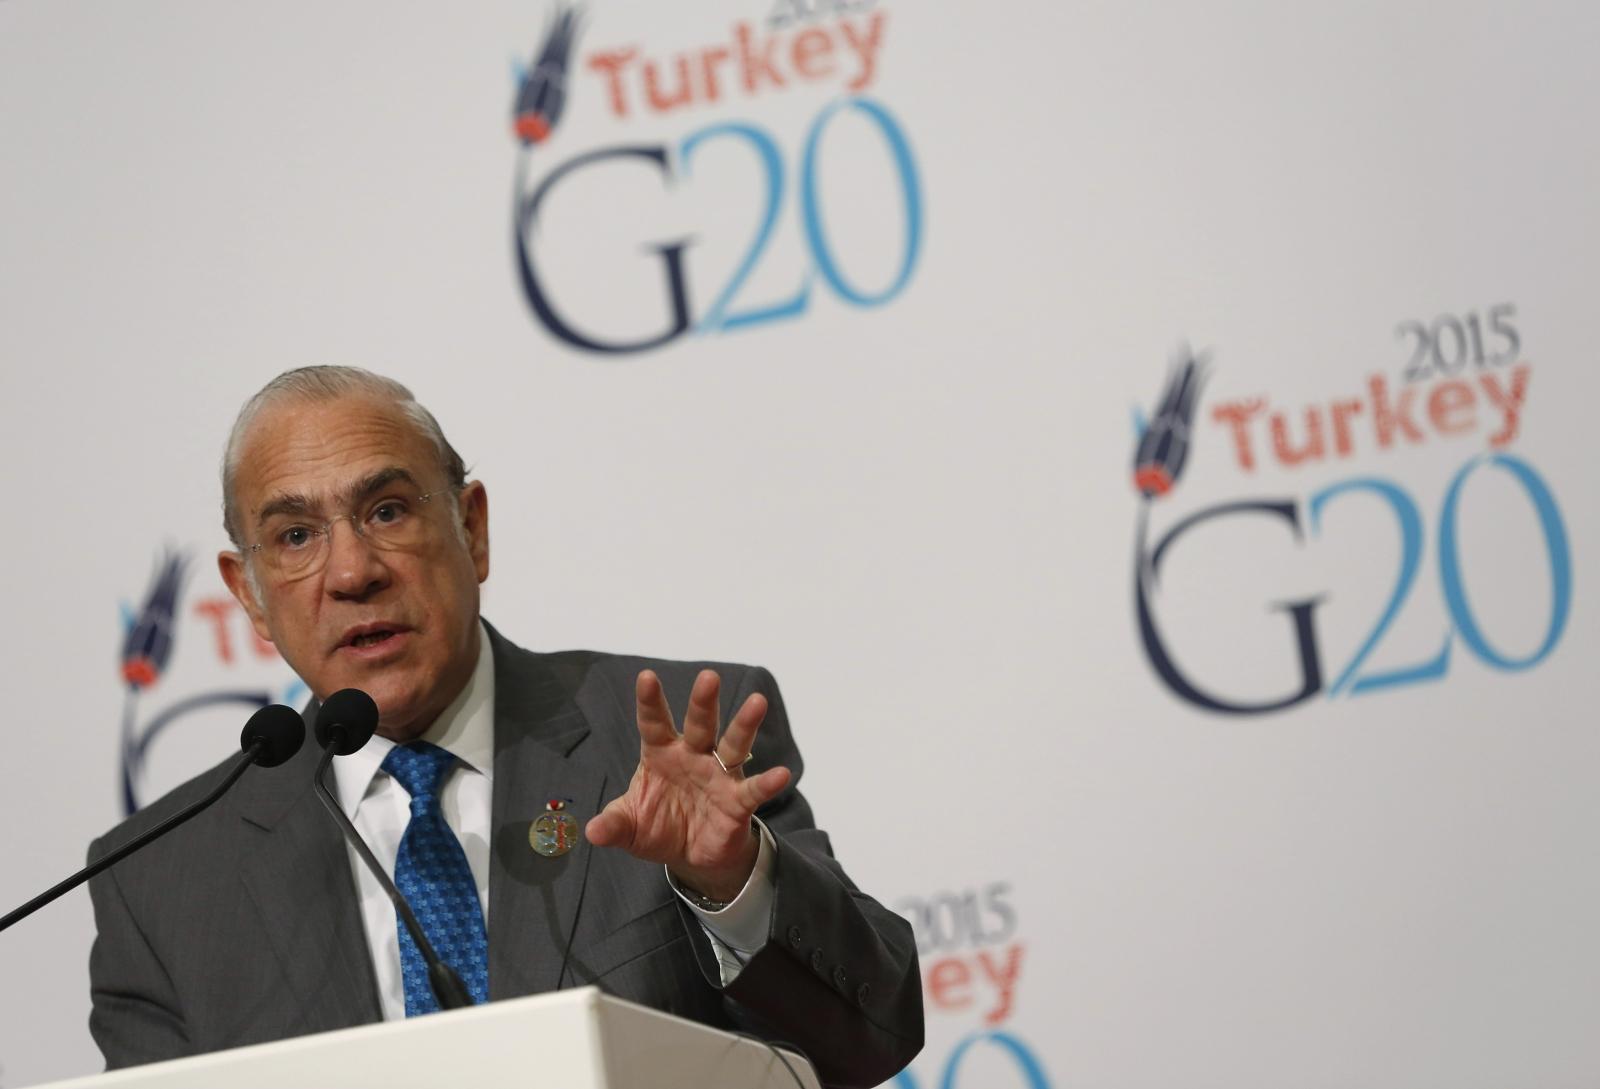 OECD agrees to help Greece reform economy